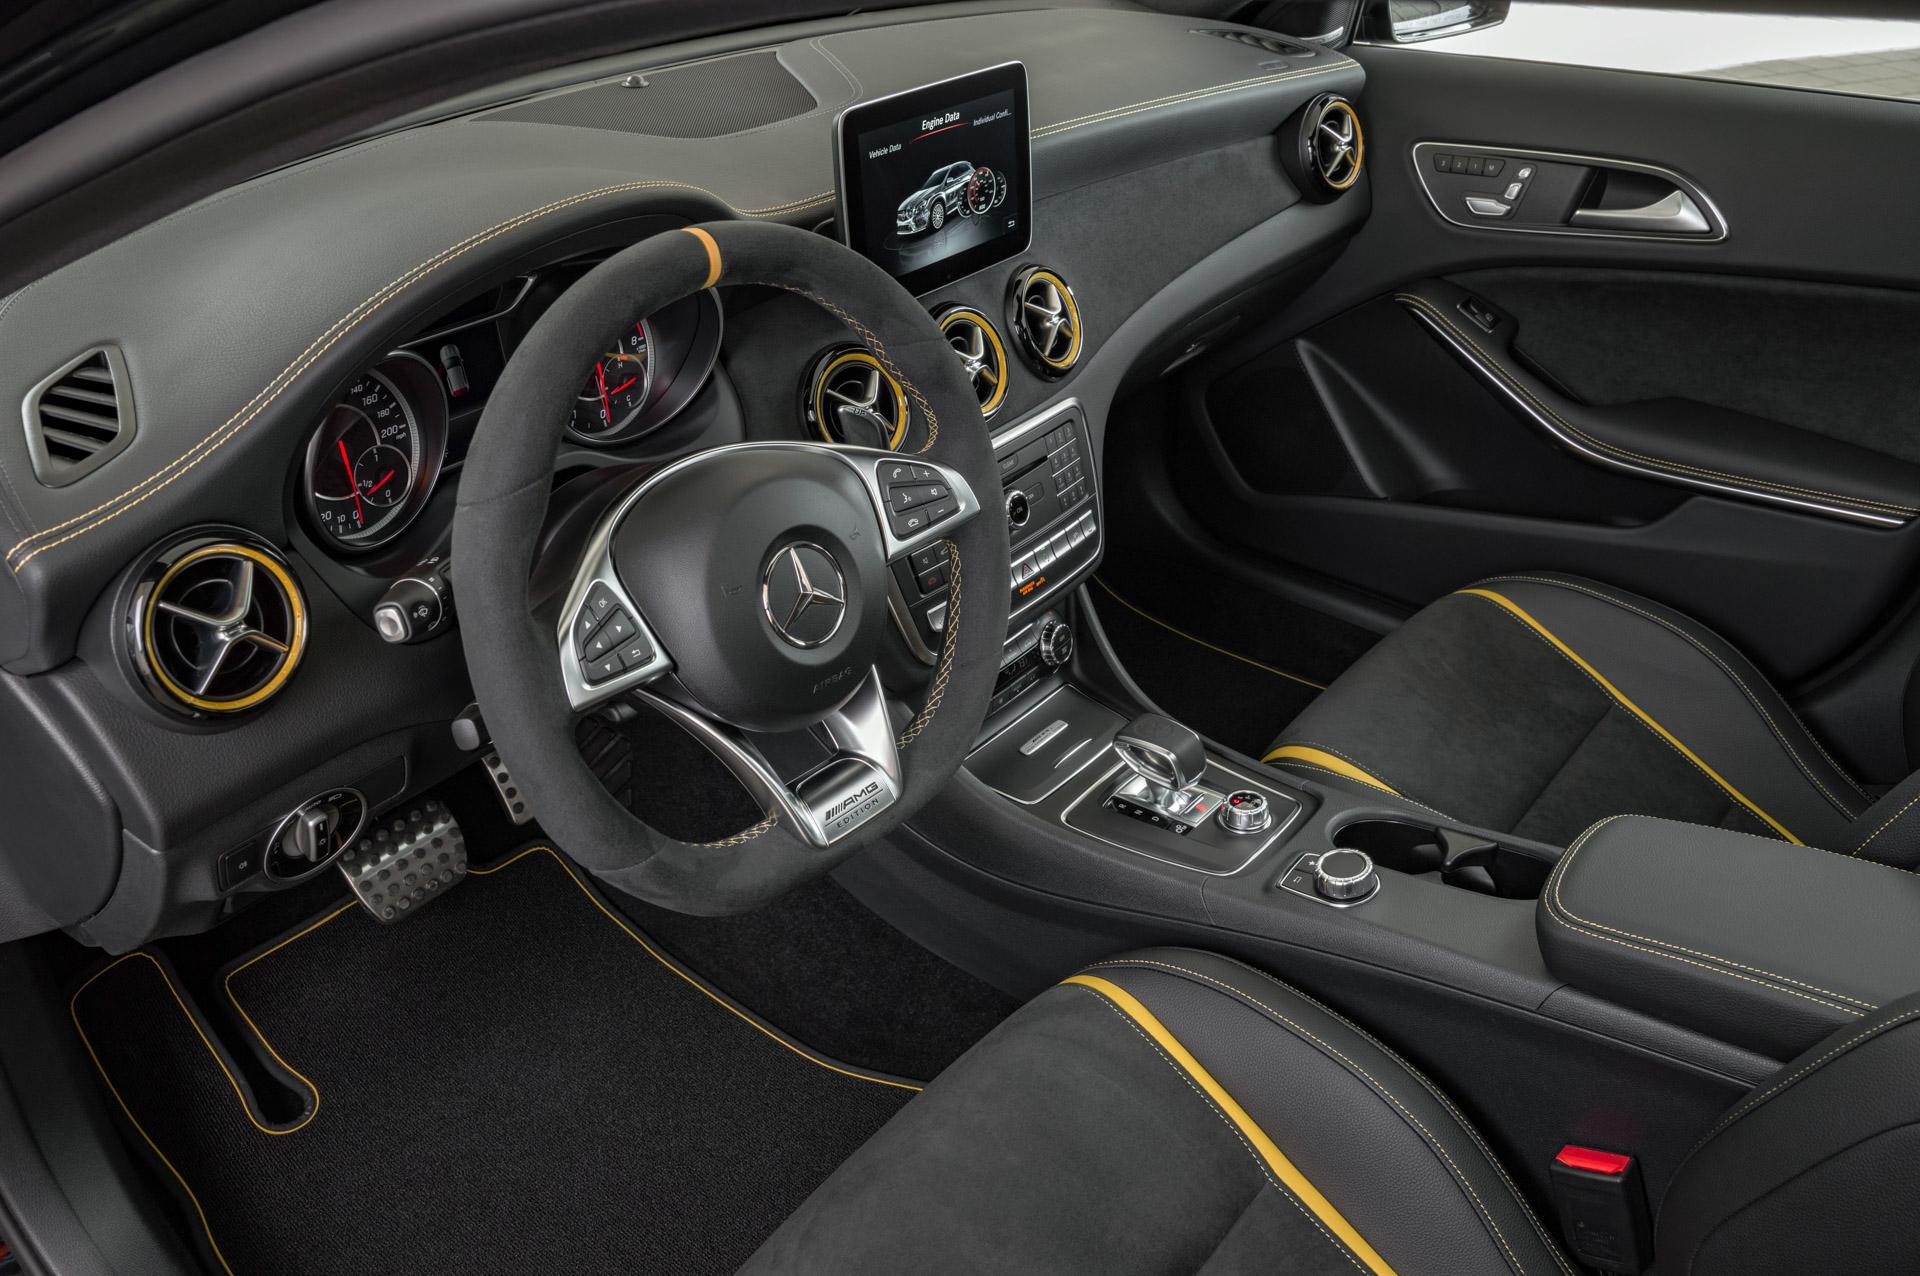 Mercedes-Benz AMG GLA 45 4MATIC Yellow Night Edition, cosmosschwarz, Innenausstattung: ARTICO/Mikrofaser DINAMICA ;Kraftstoffverbrauch kombiniert: 7,4 /100 km, CO2-Emissionen kombiniert: 172 g/km Mercedes-Benz AMG GLA 45 4MATIC Yellow Night Edition, cosmos black, Interior: ARTICO/microfibre DINAMICA; Fuel consumption combined:  7.4 l/100 km; Combined CO2 emissions: 172 g/km